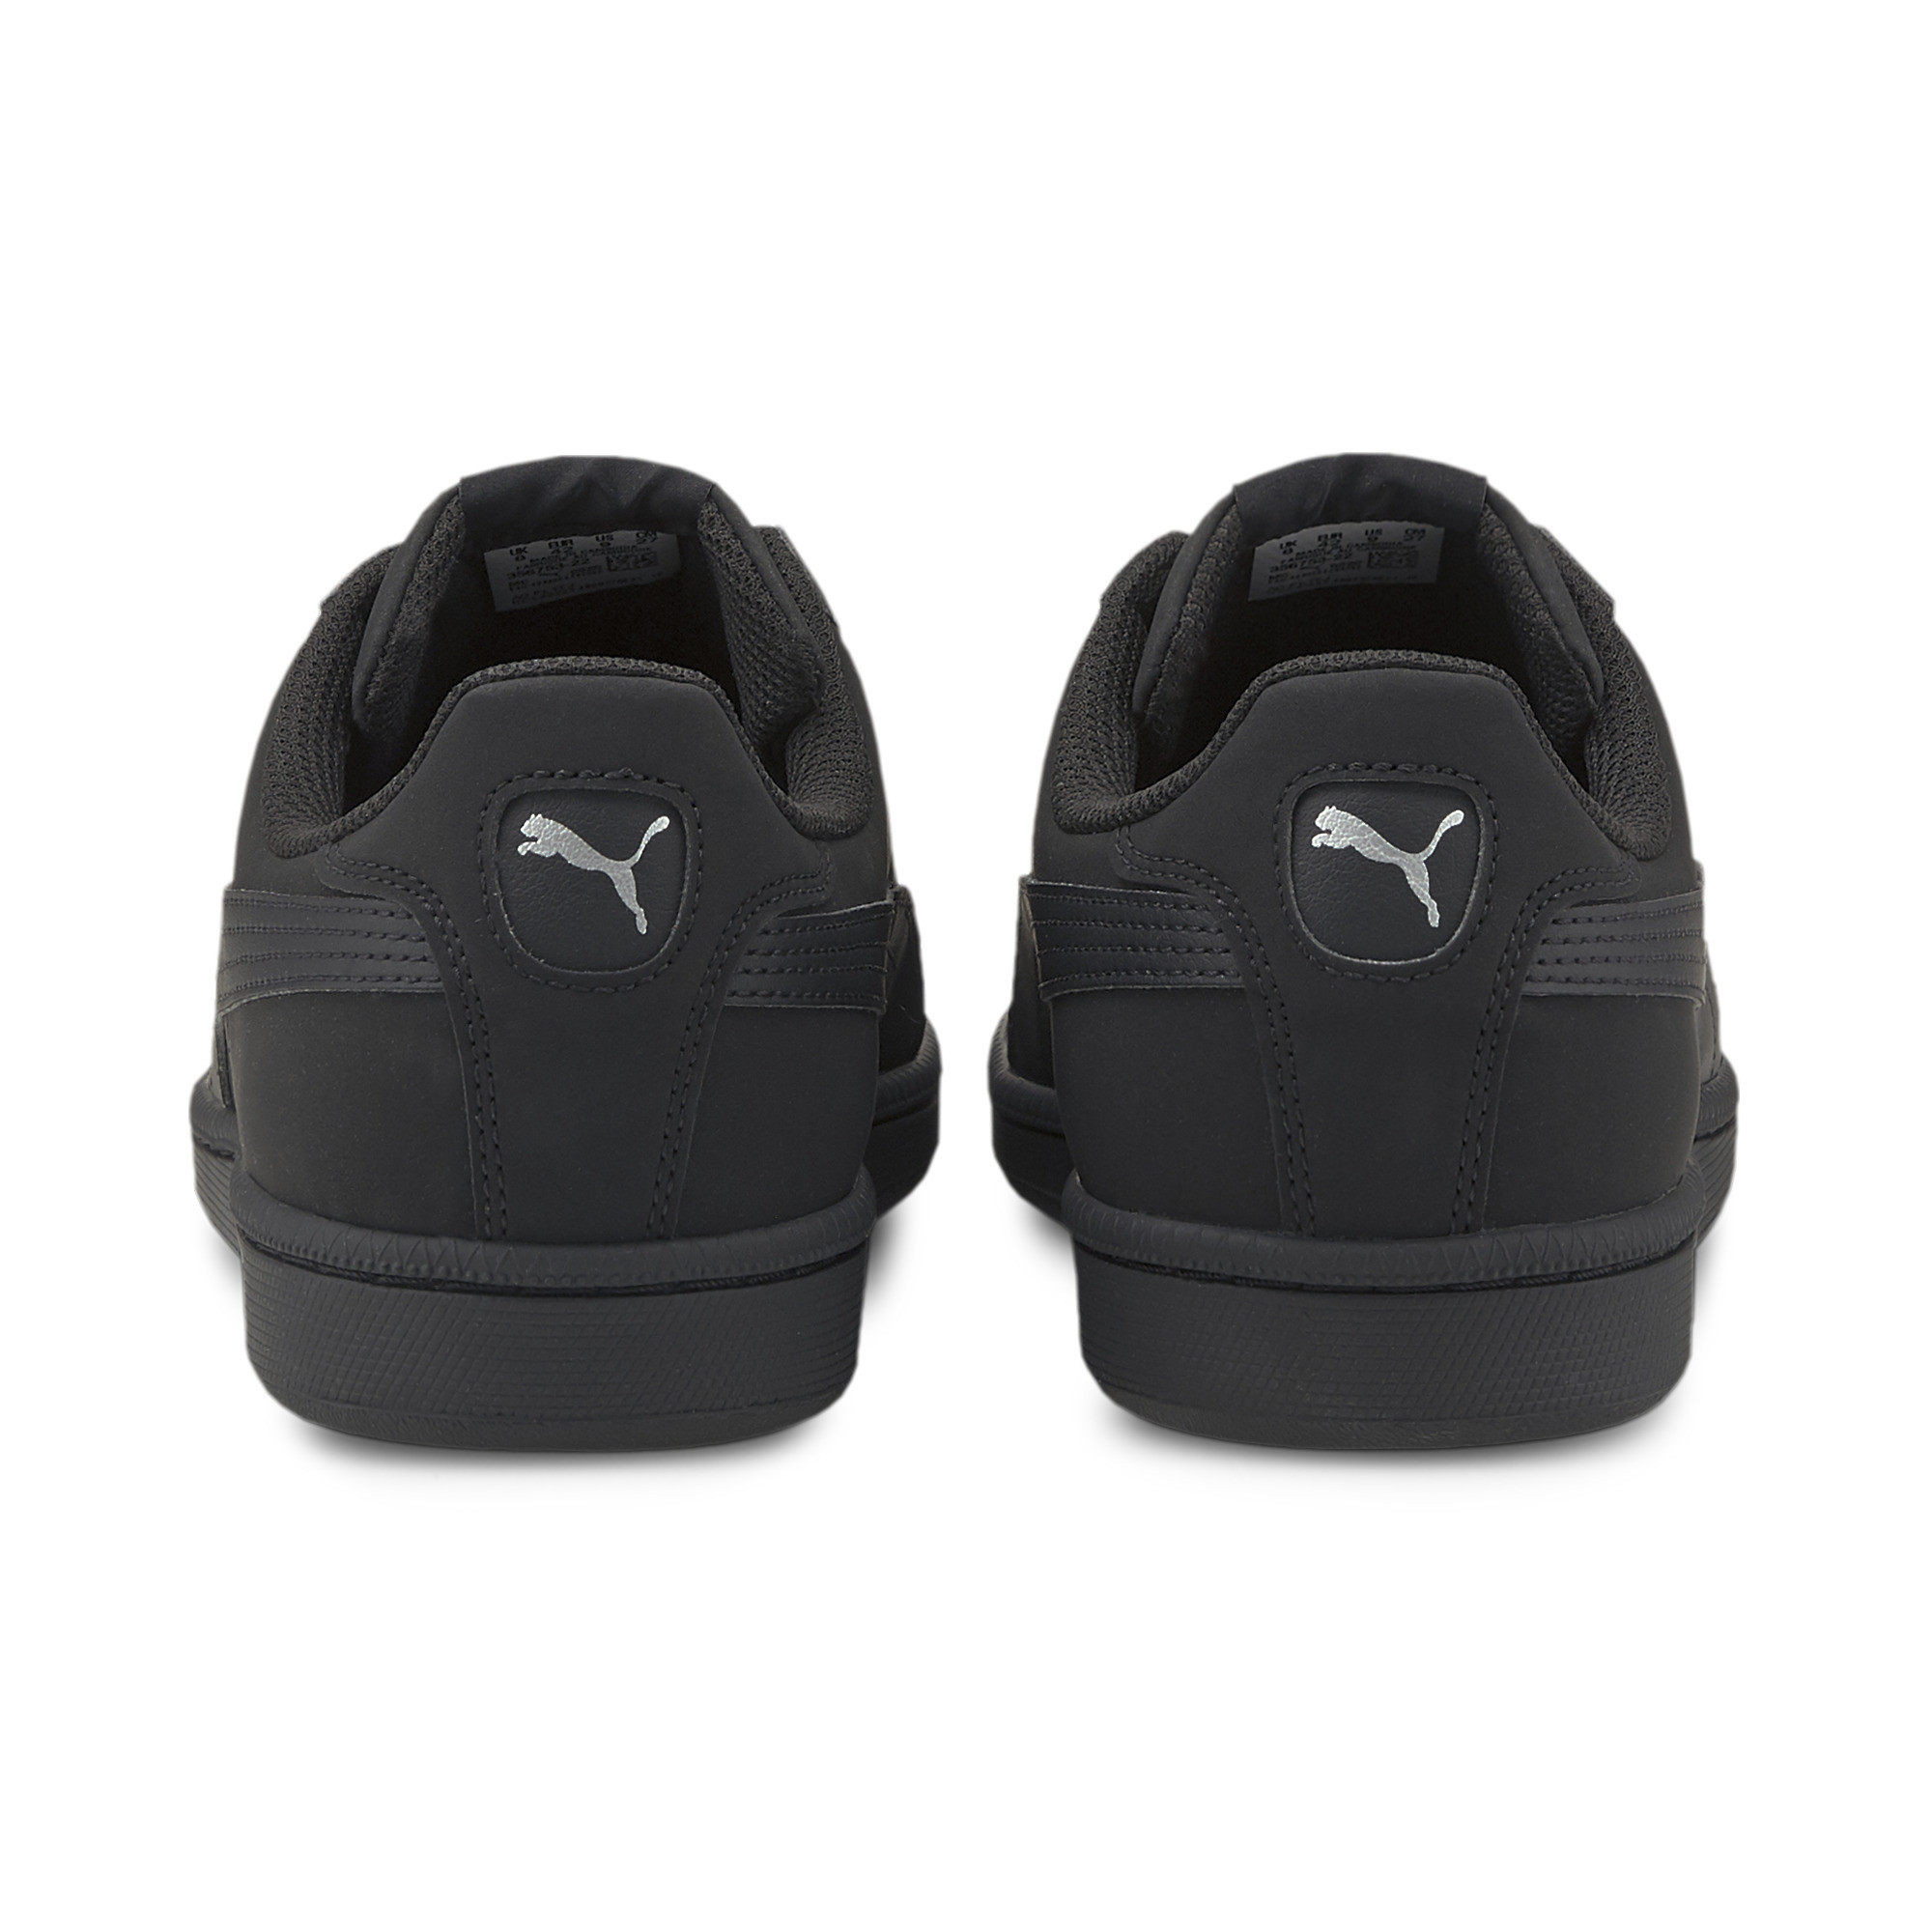 Indexbild 14 - PUMA Smash Buck Sneaker Unisex Schuhe Sport Classics Neu